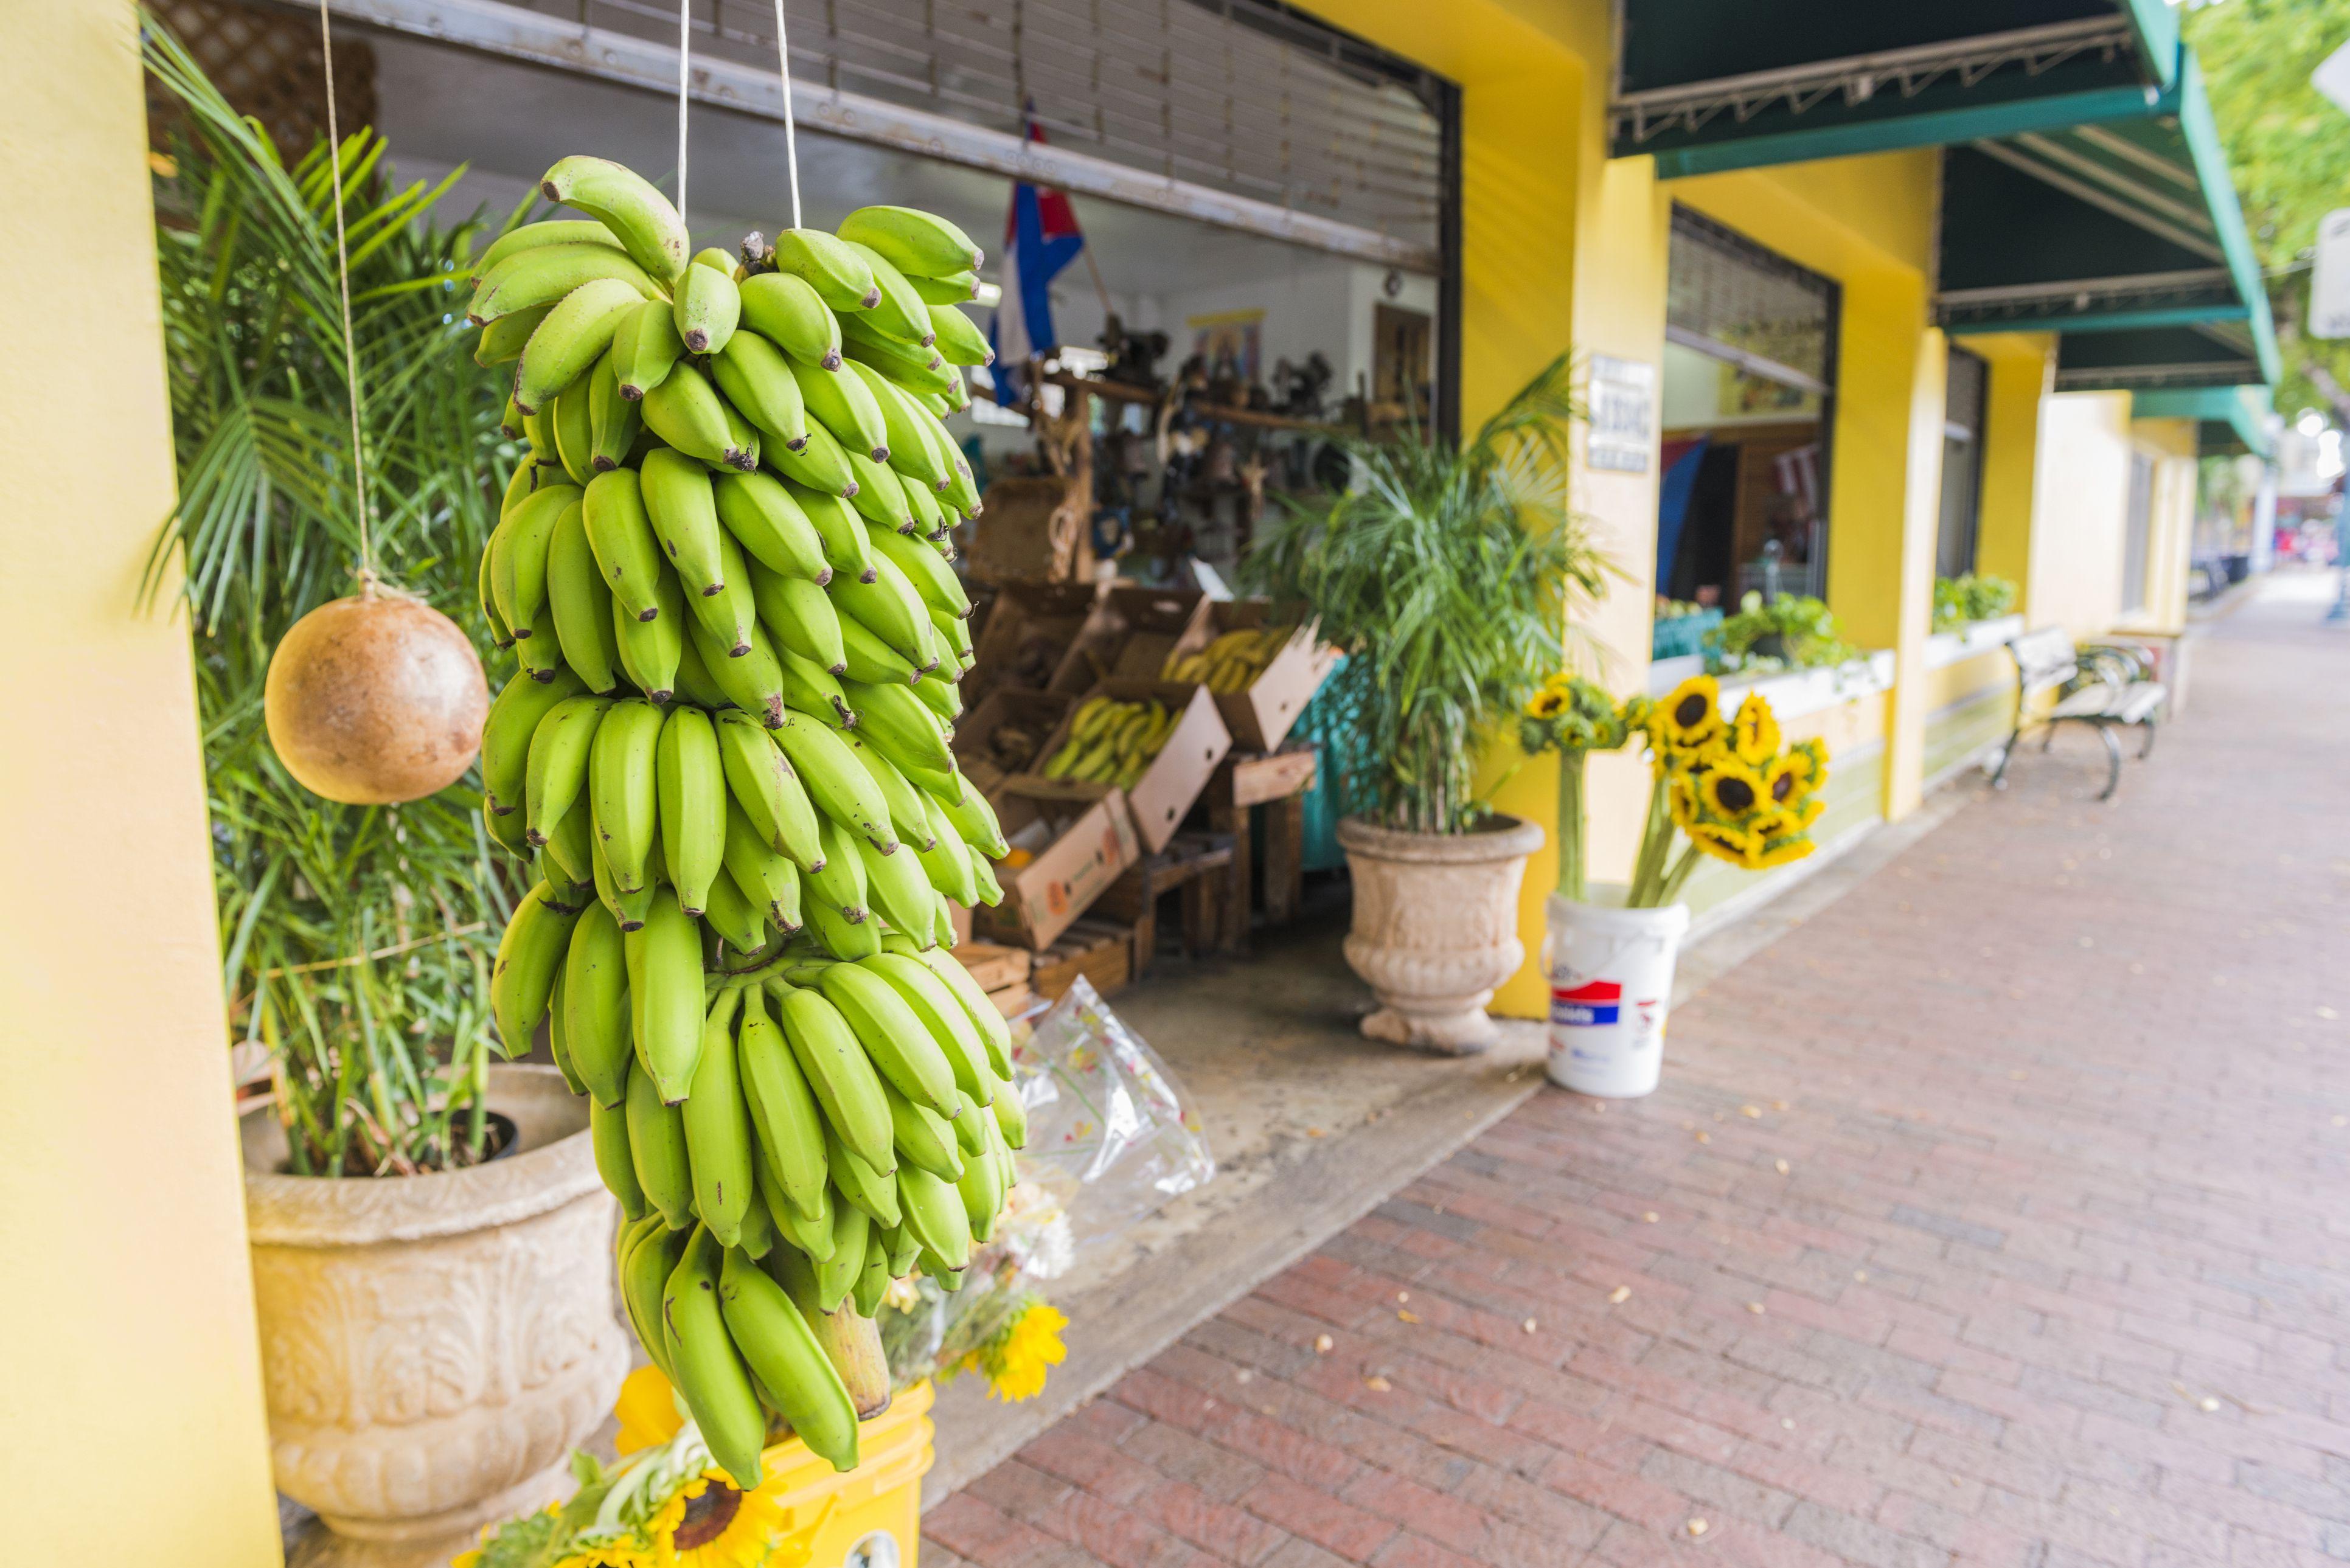 Bananas For Sale Miami Little Havana Business on Calle Ocho